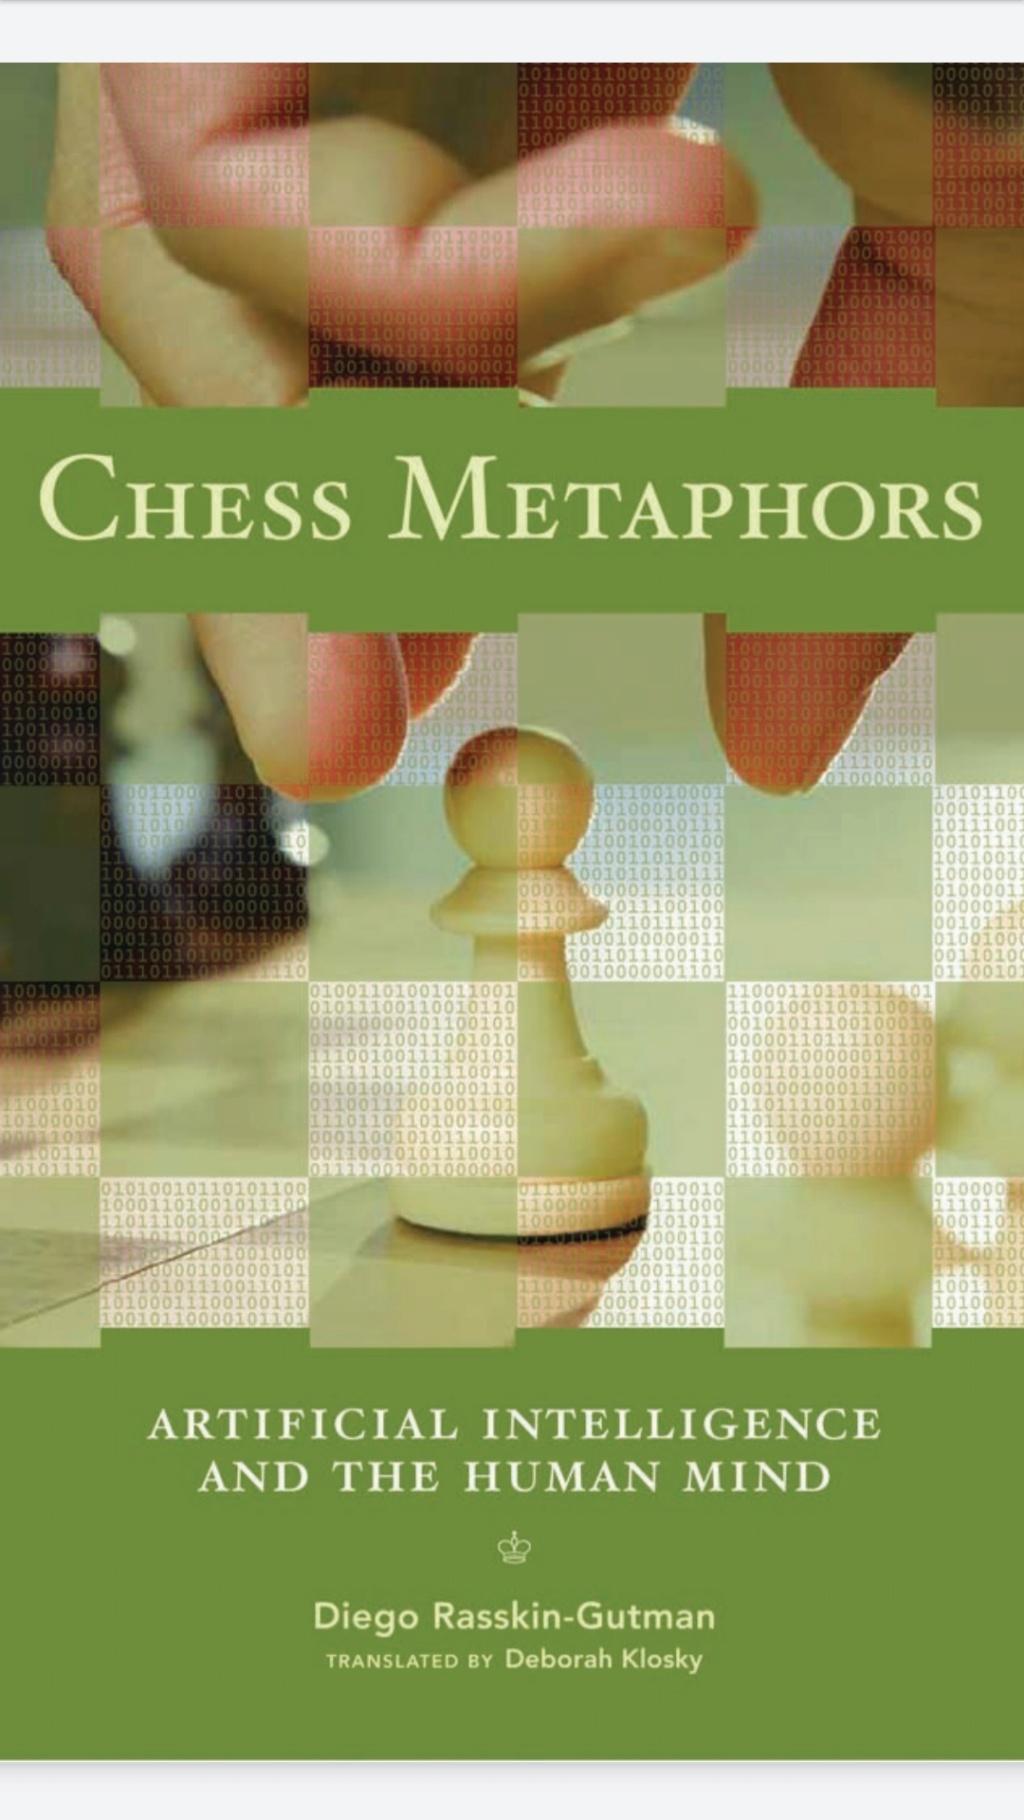 Chess Metaphors  Book by Diego Rasskin-Gutman Scree106